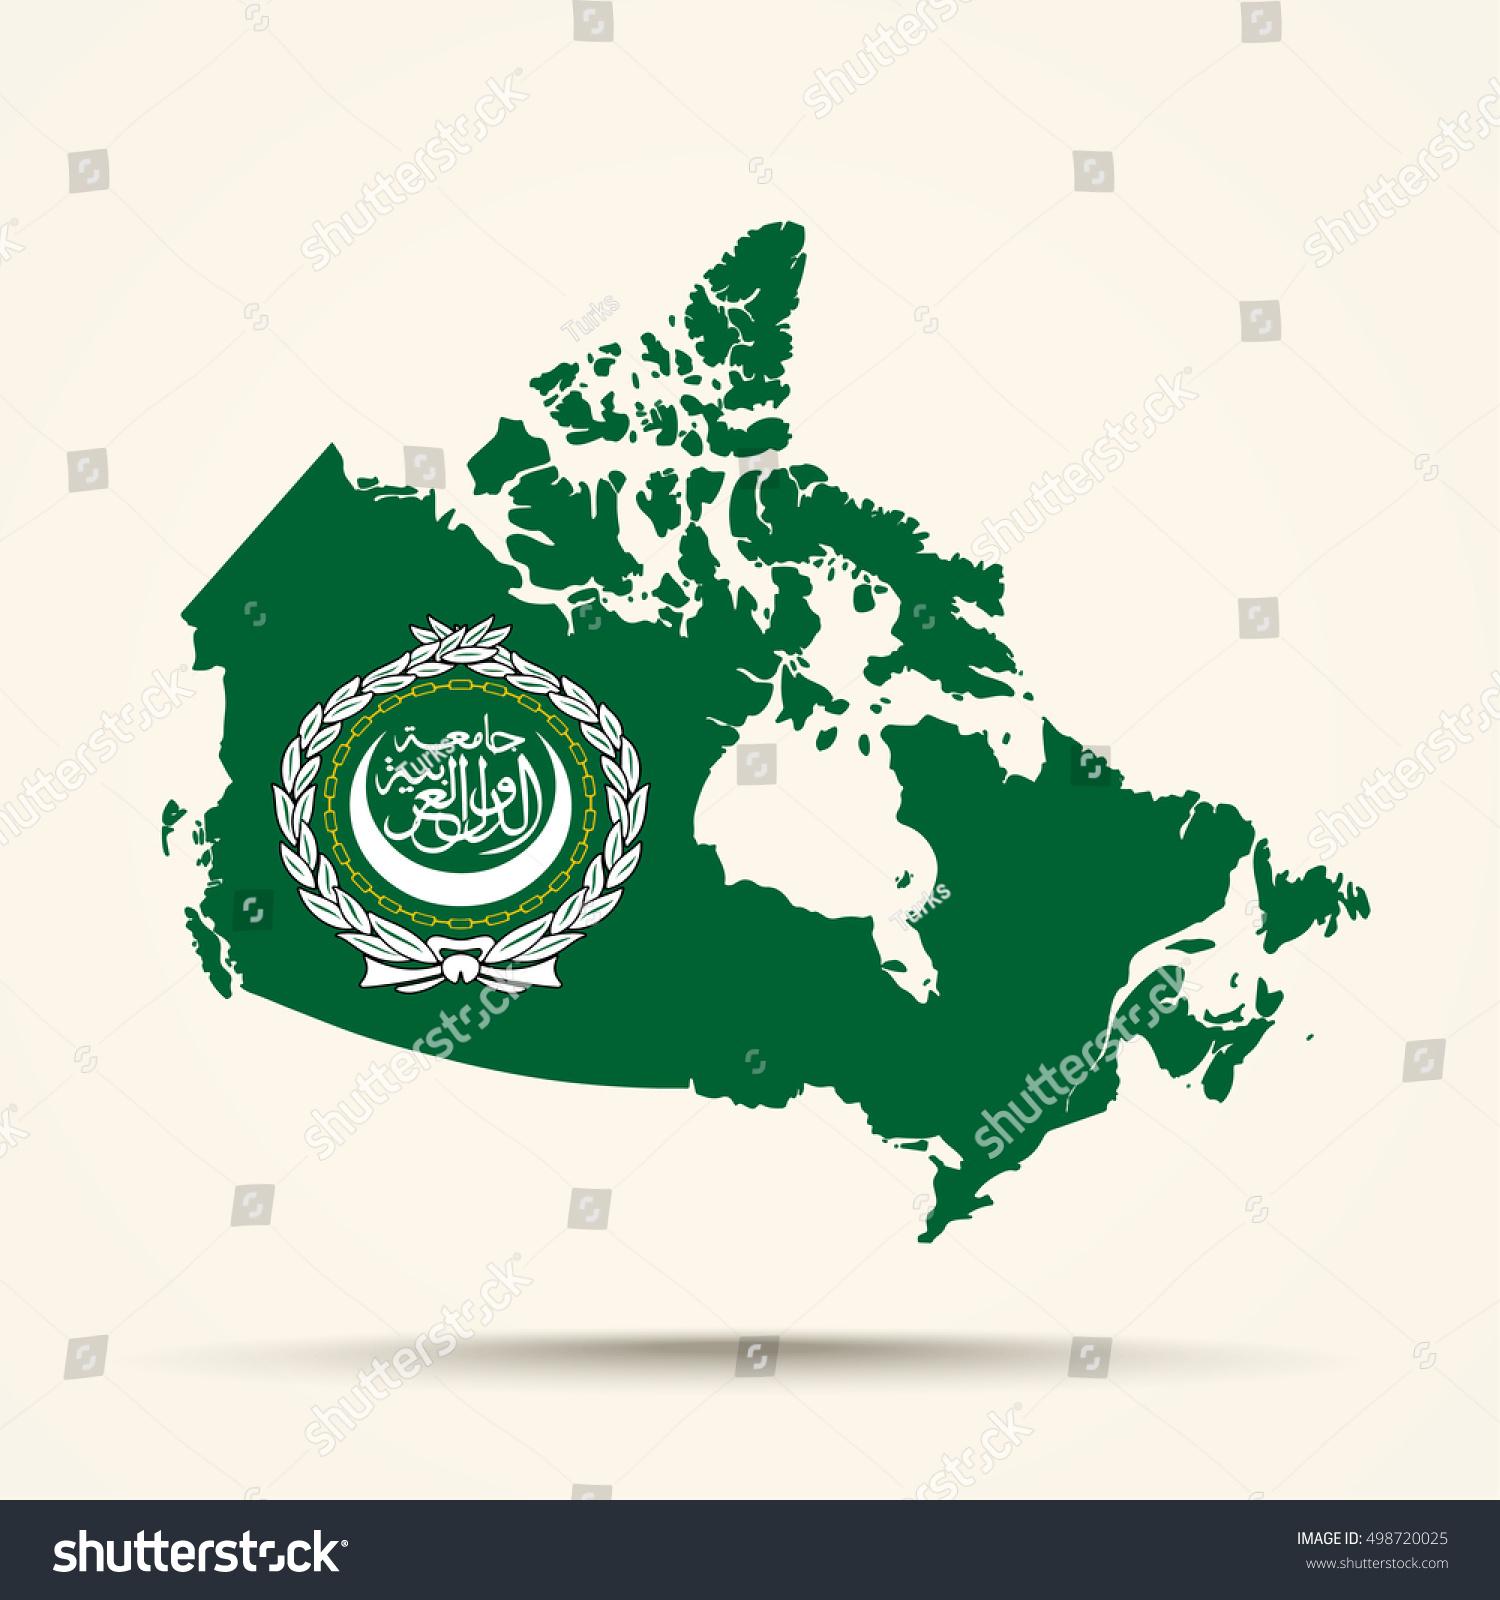 Picture of: Vector De Stock Libre De Regalias Sobre Map Canada Arab League Flag Colors498720025